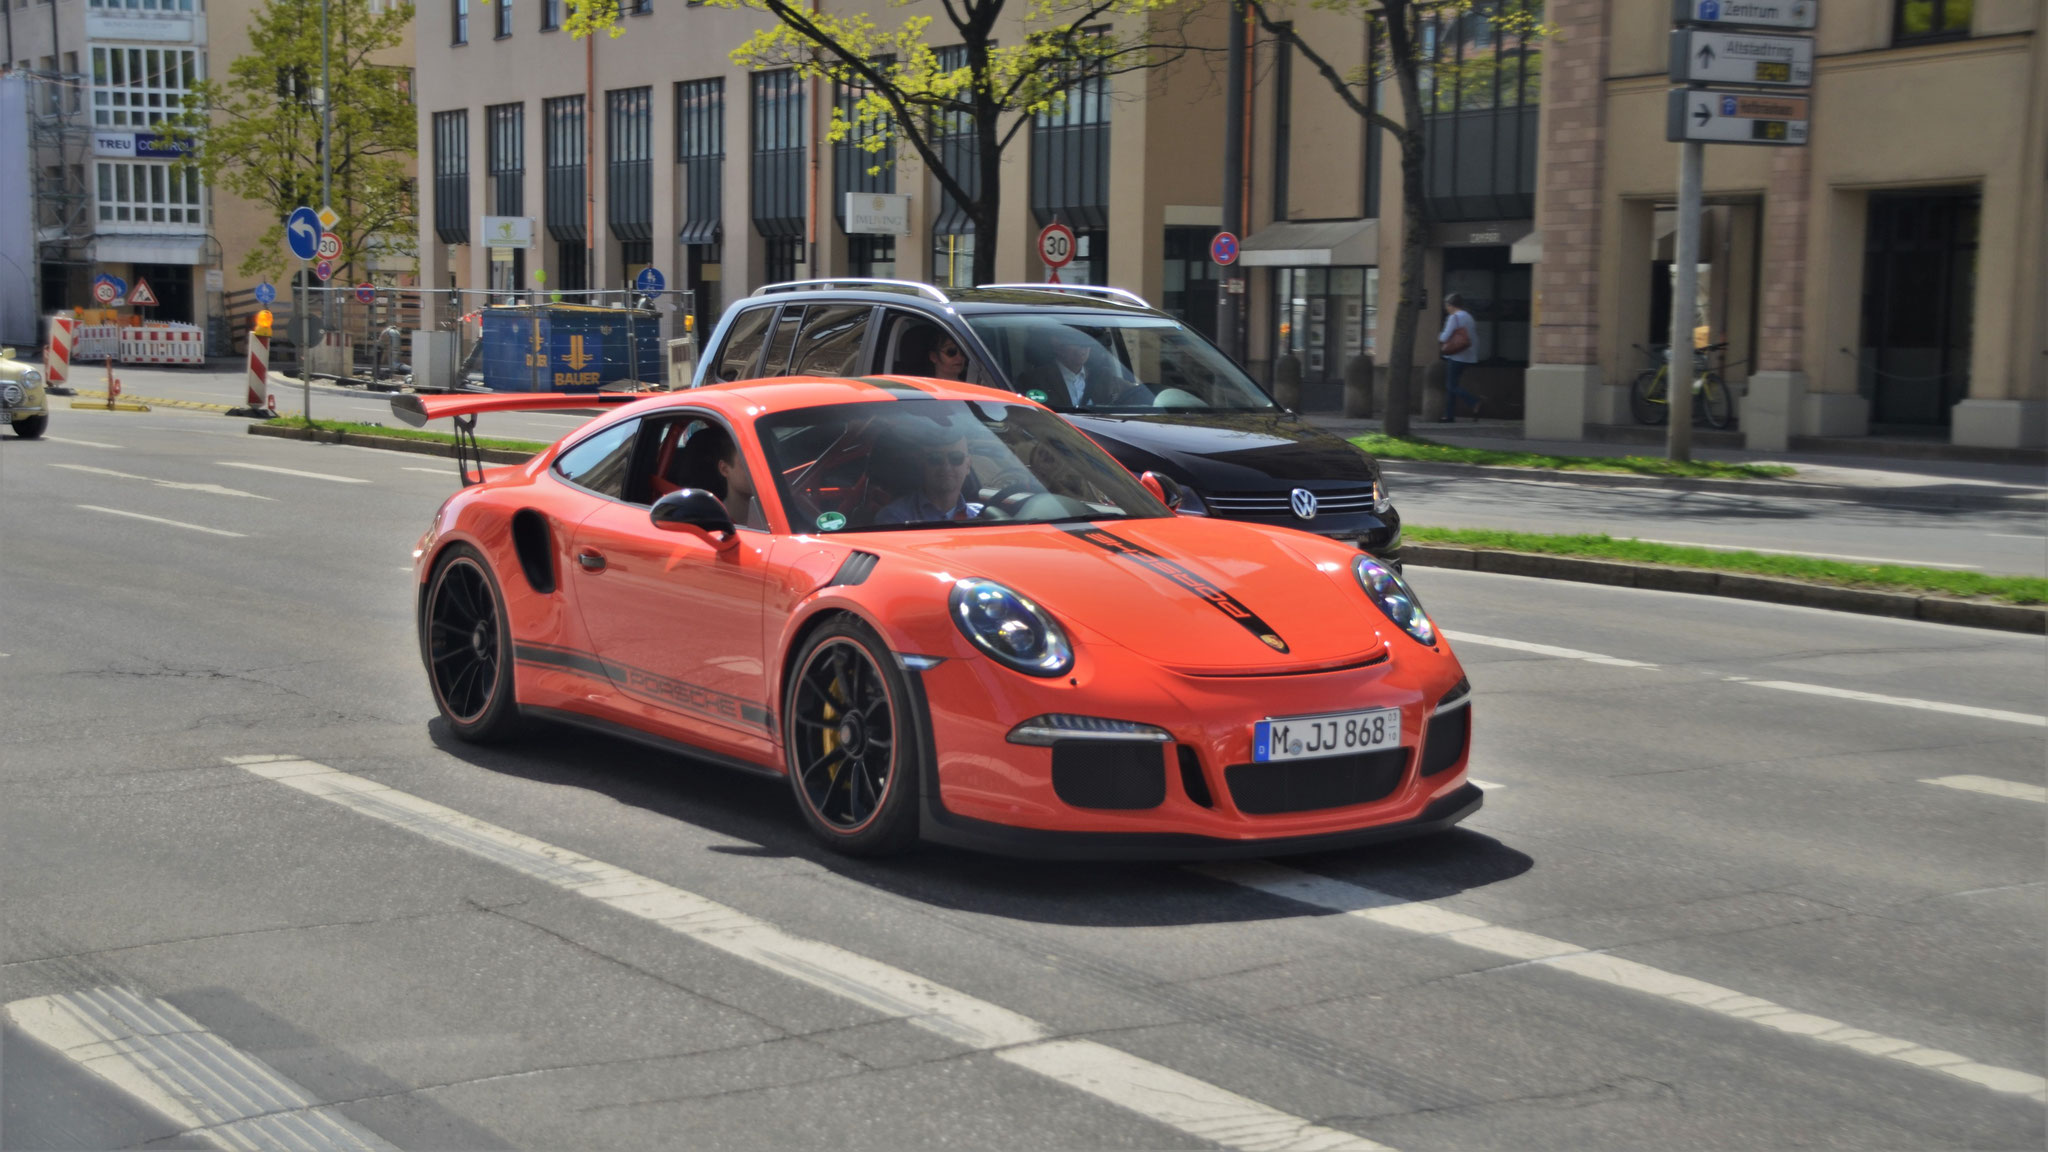 Porsche 911 GT3 RS - M-JJ-868